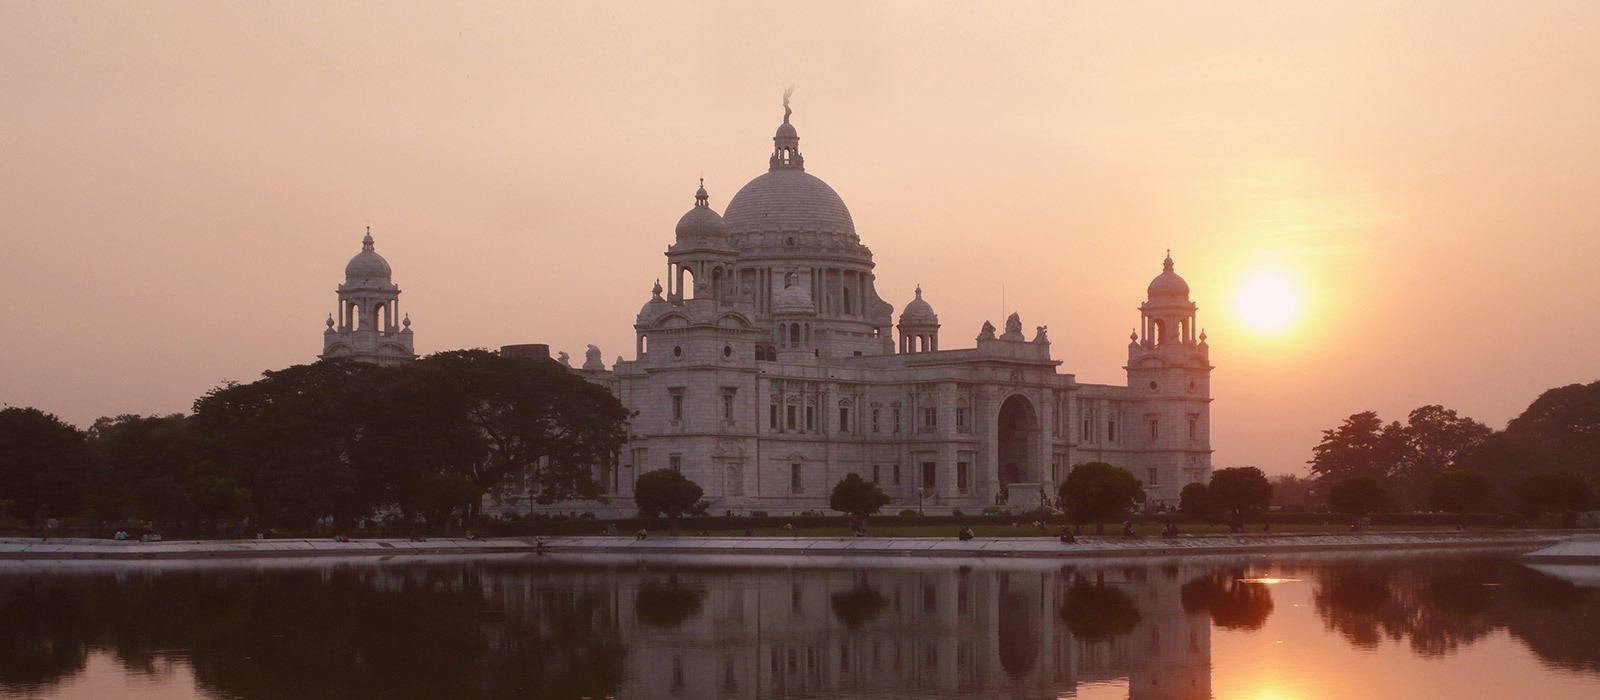 Taj Mahal und Berggipfel: Vom Goldenen Dreieck zum Himalaya Urlaub 7